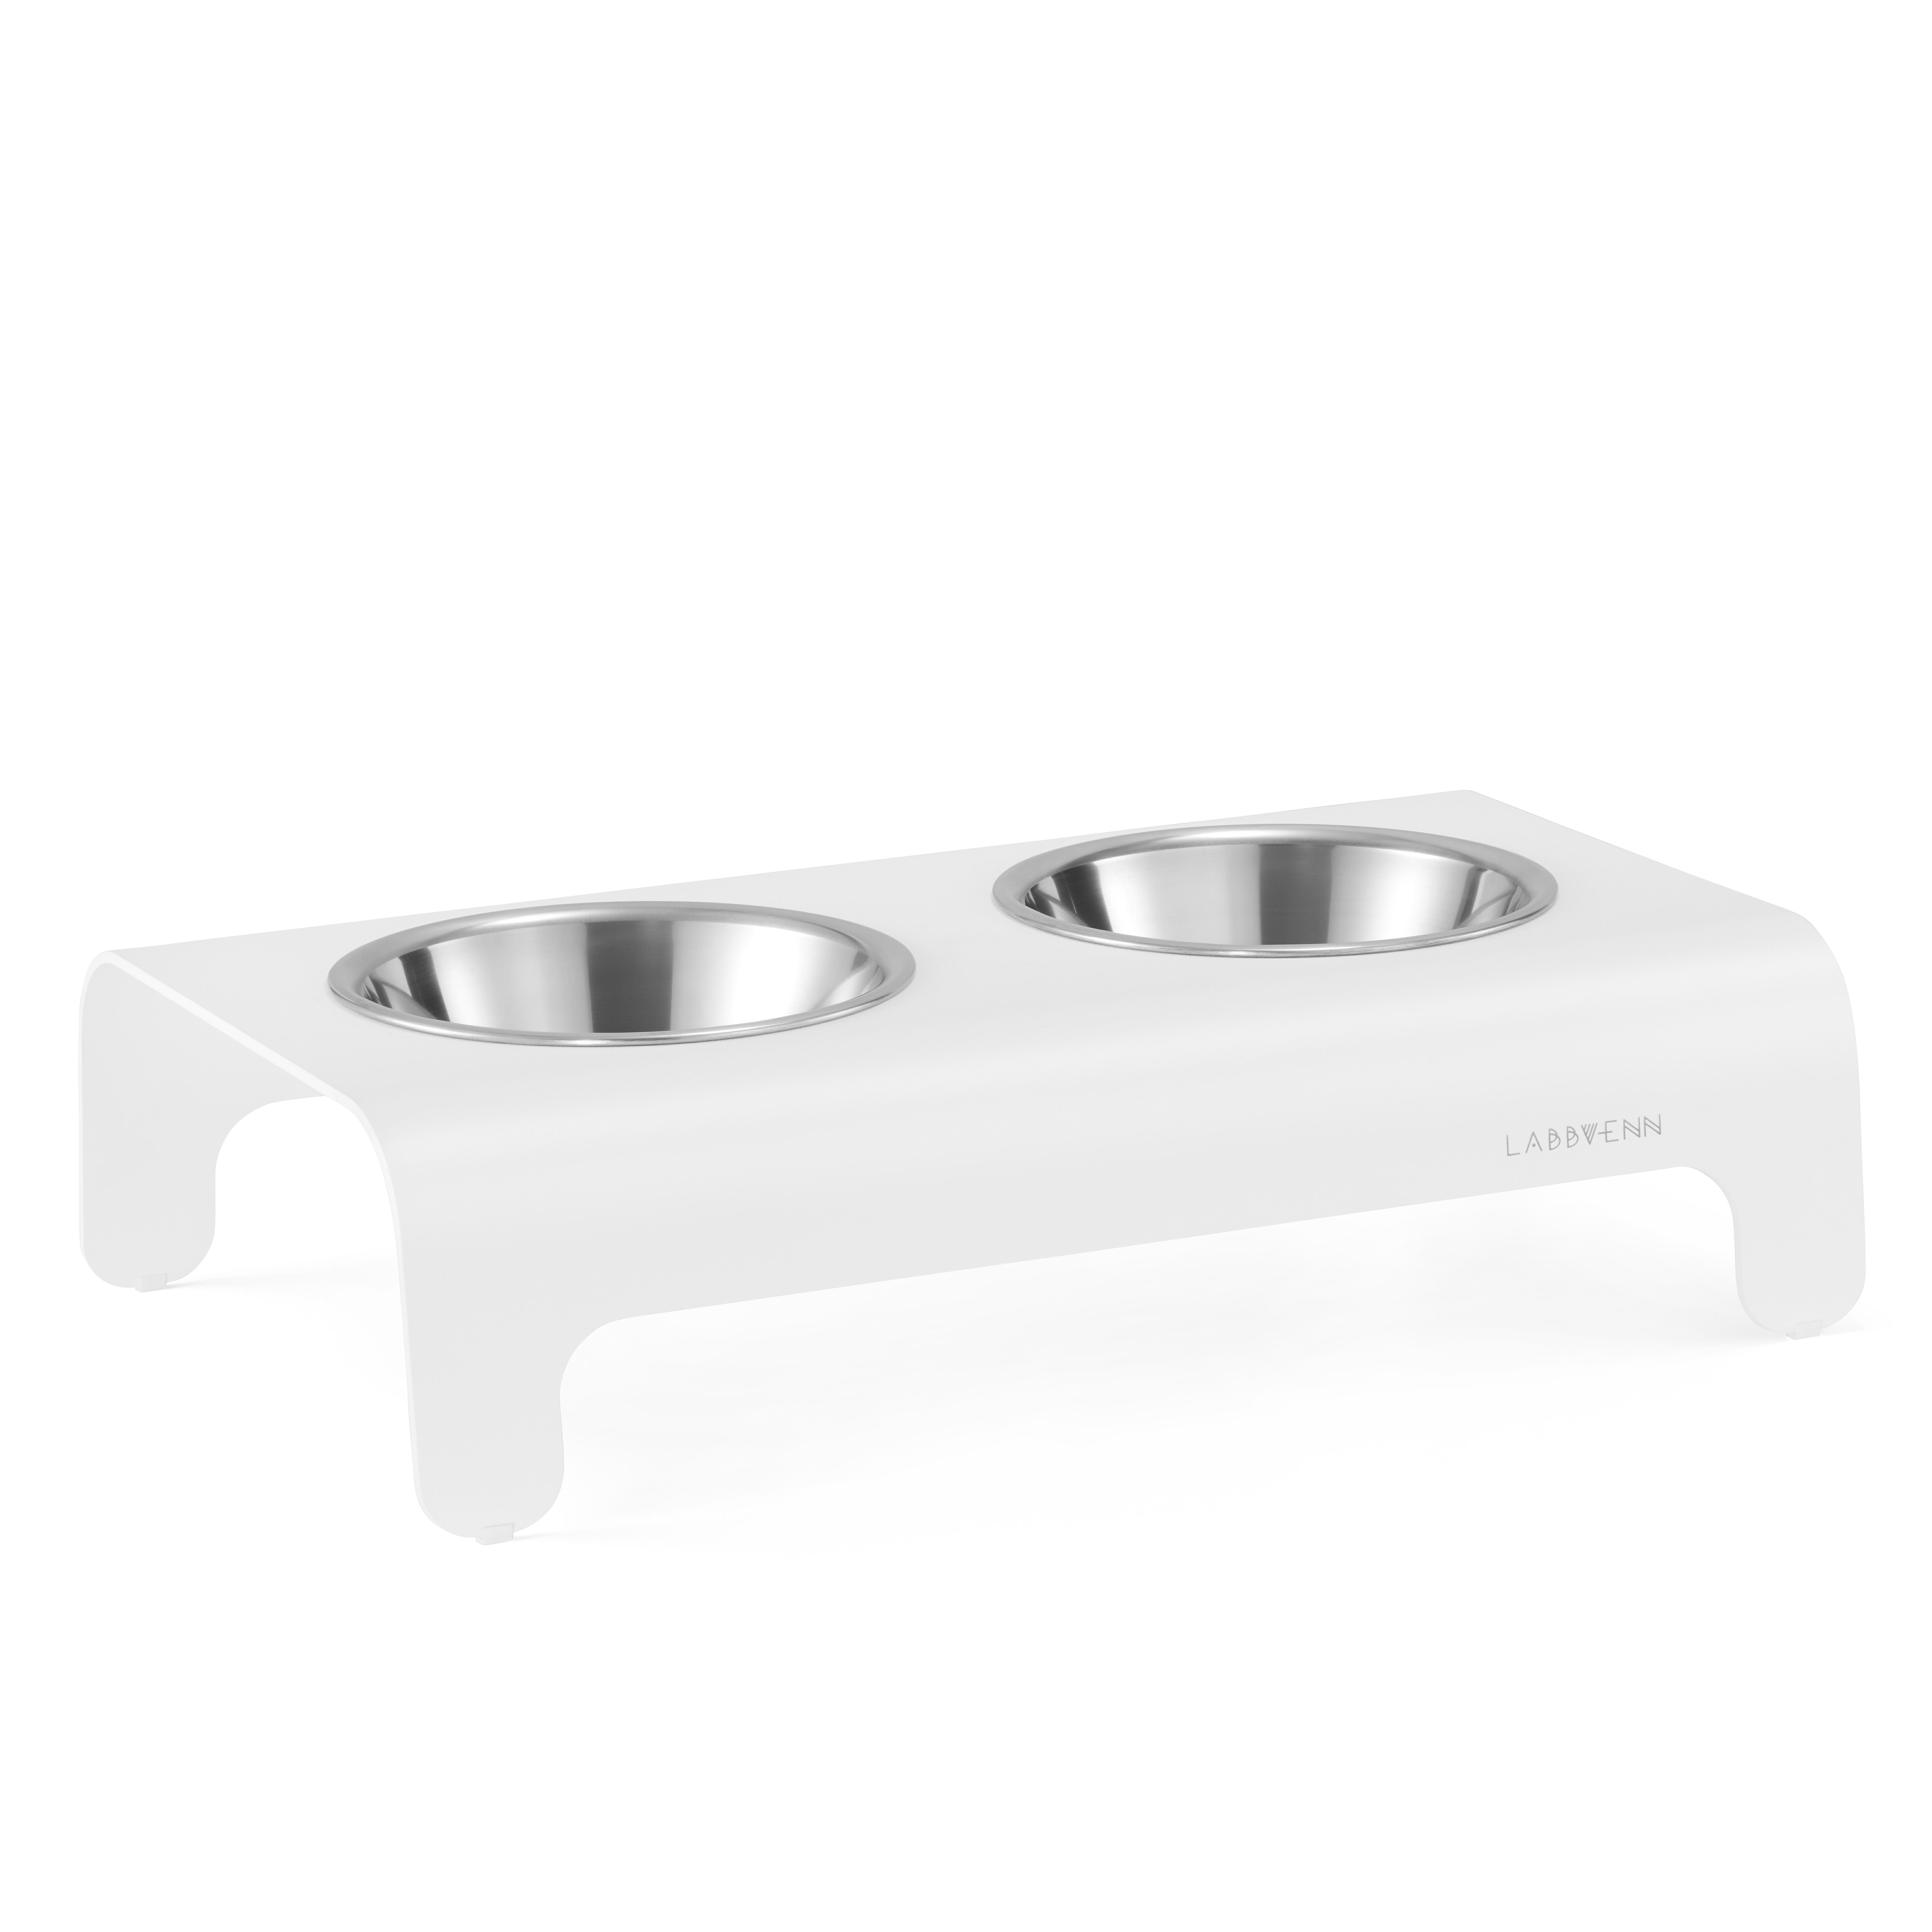 Hundenapf RICO Labbvenn weiß (2)